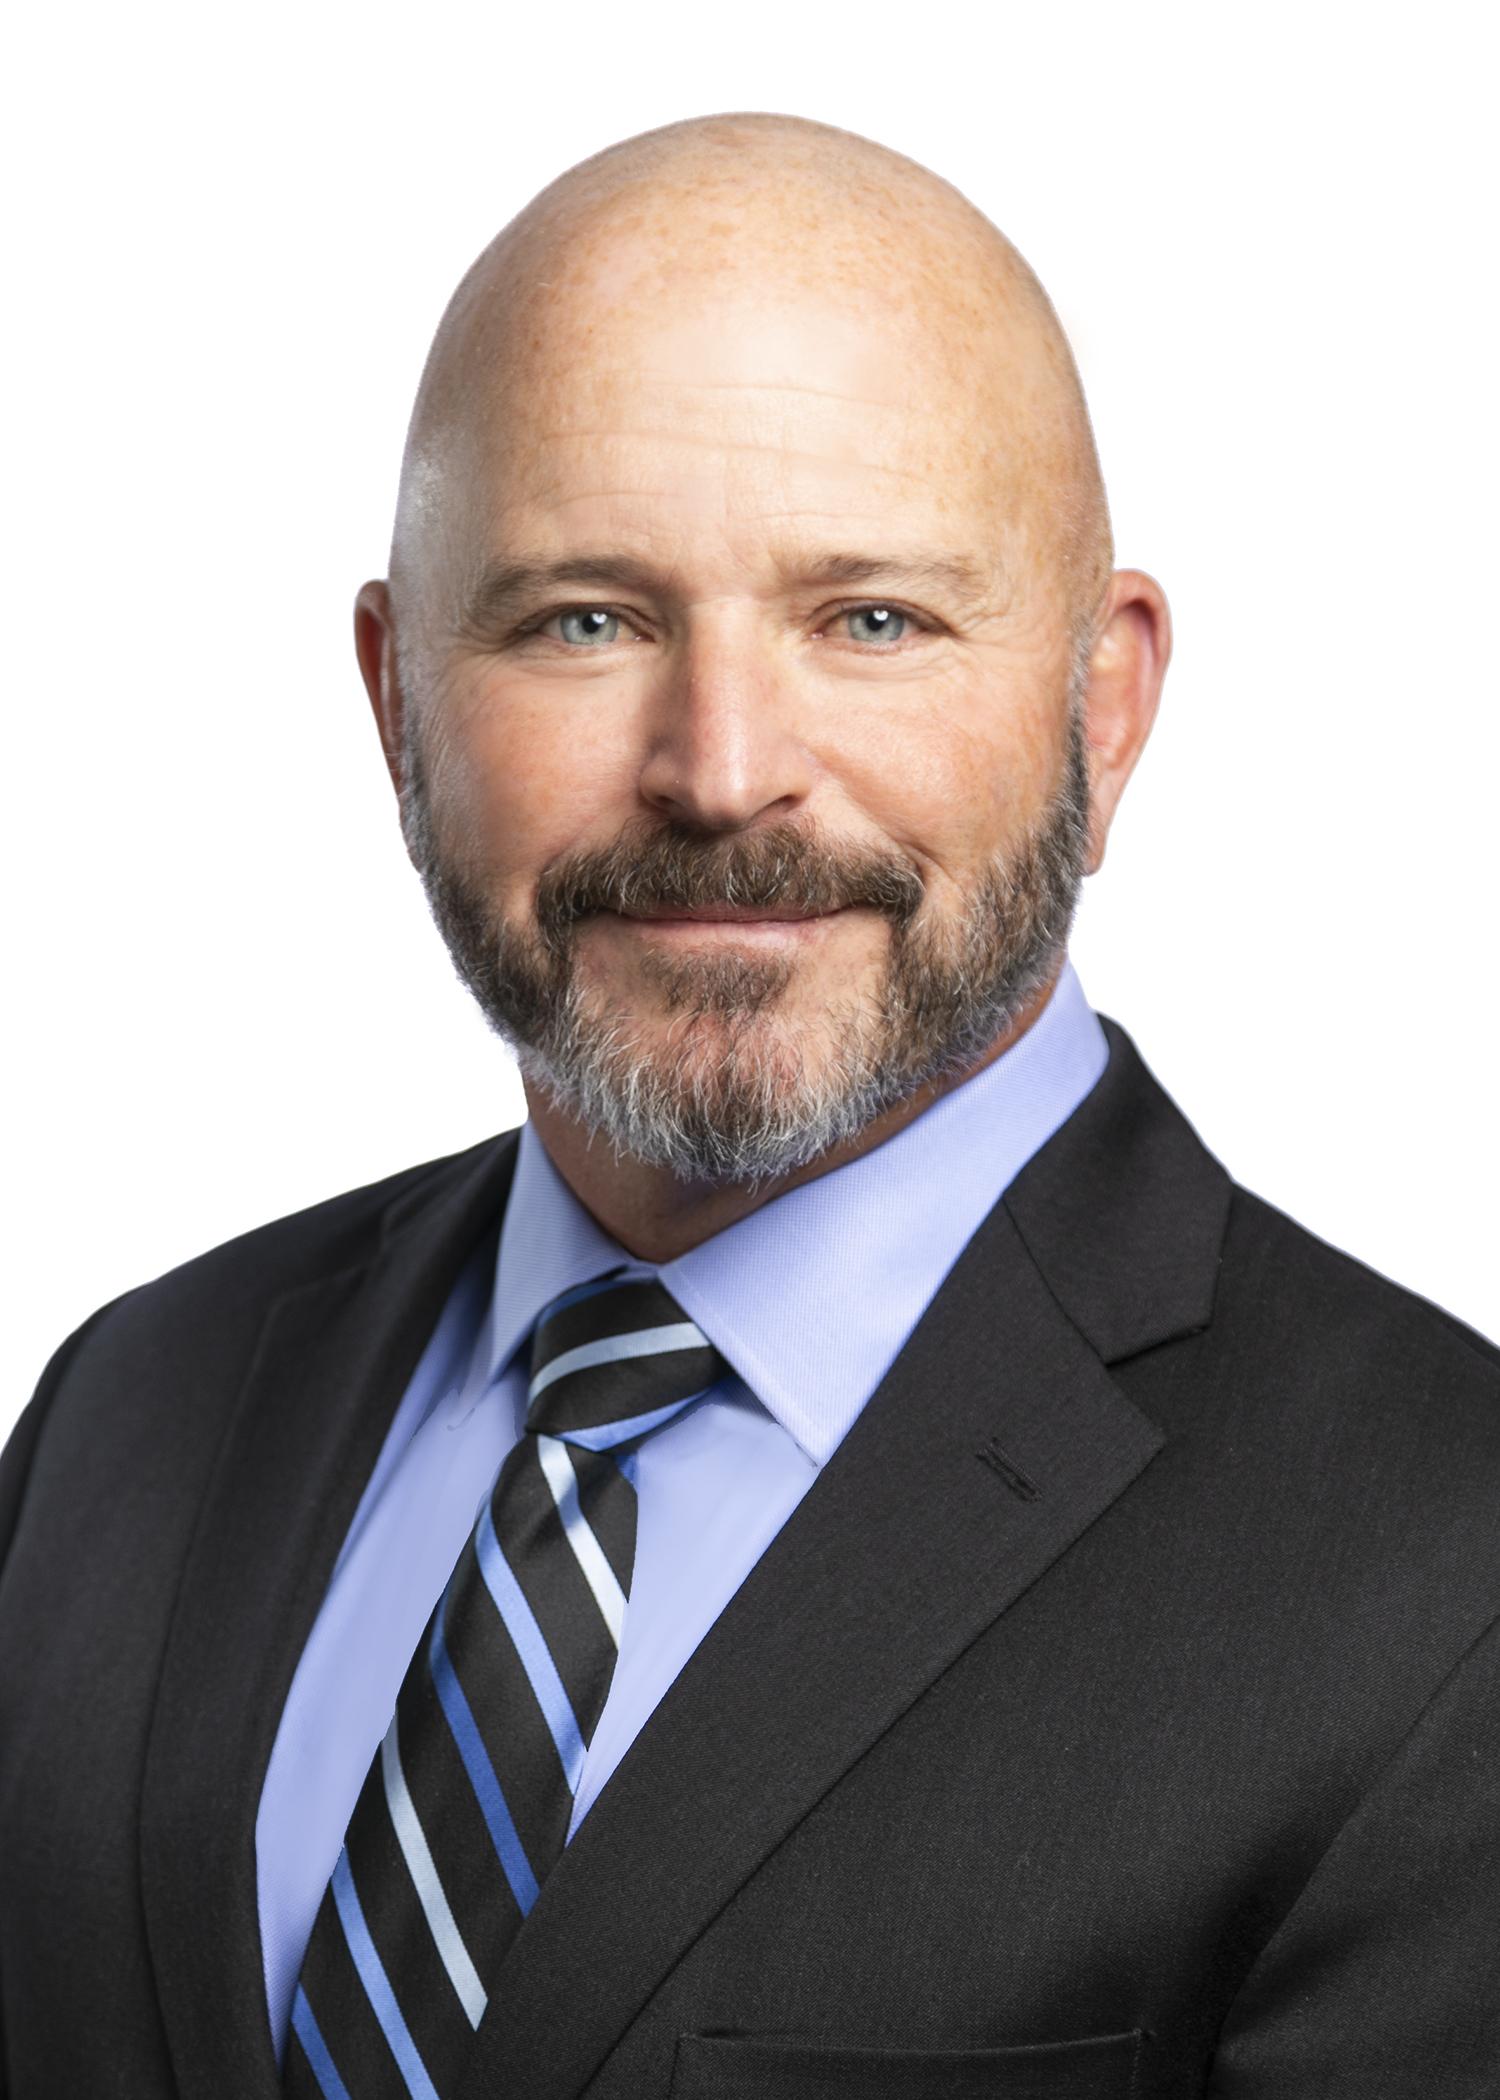 Mike Jones  President, Business Capital, CIT